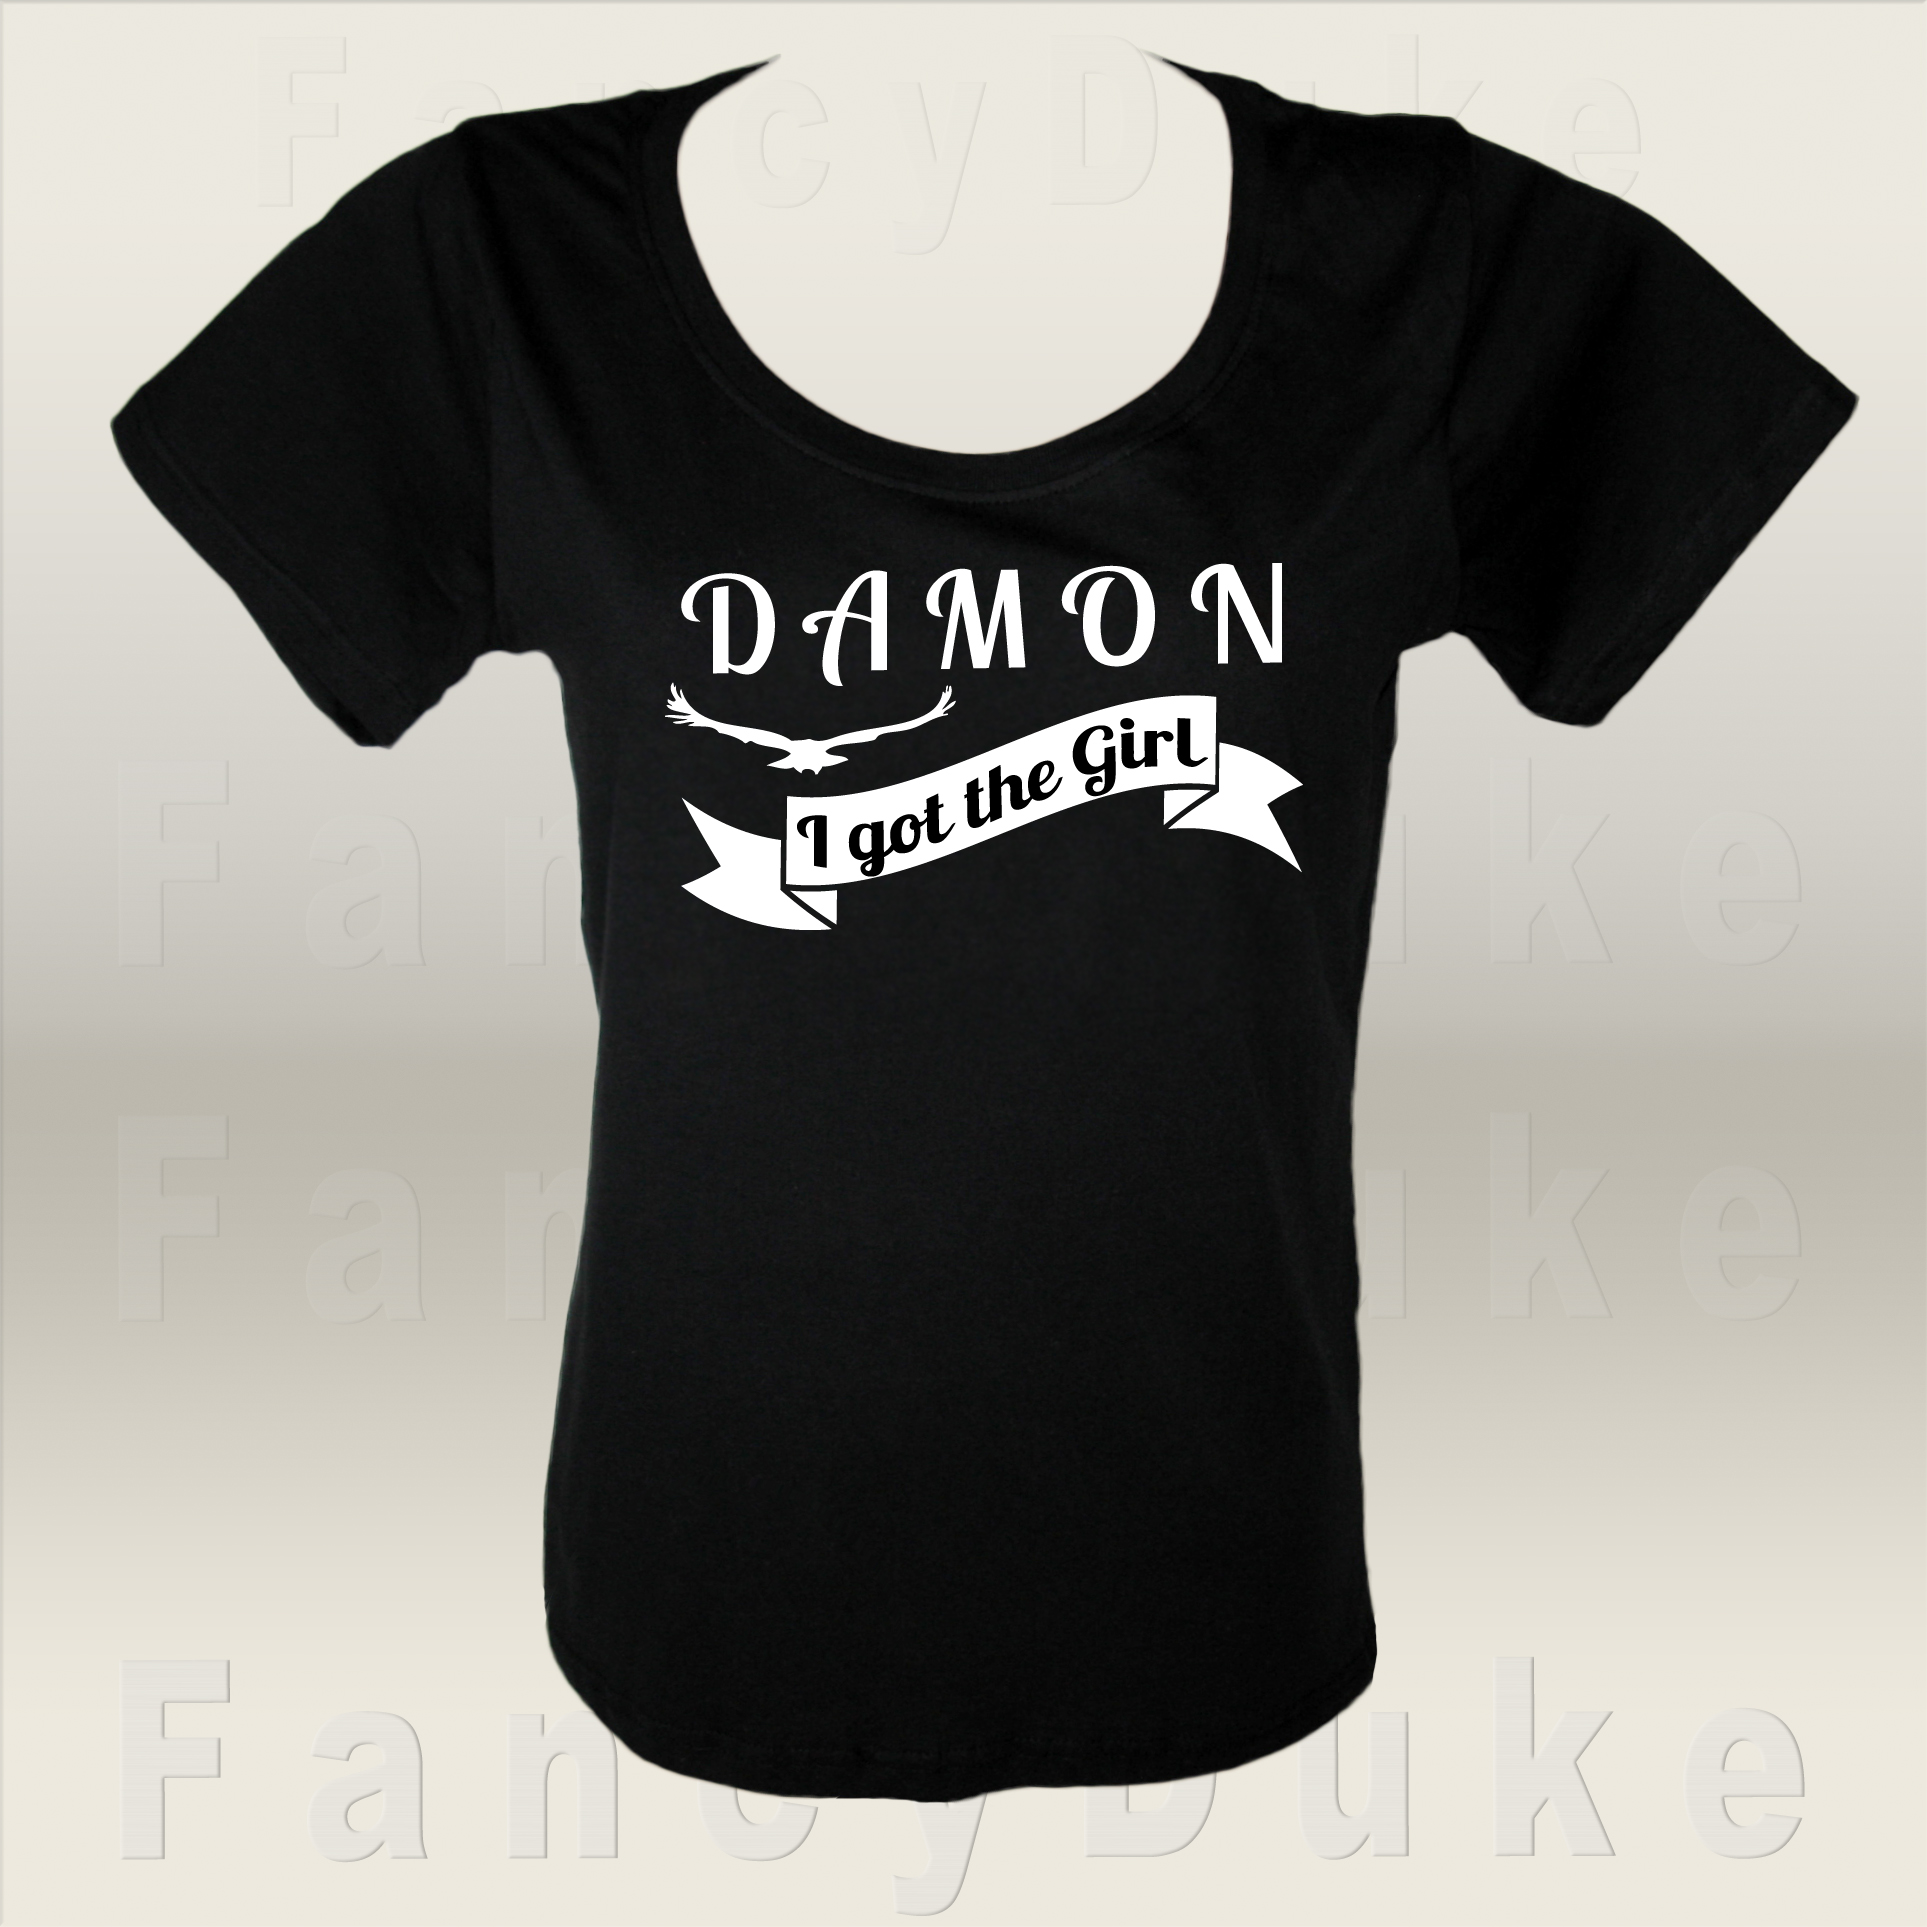 Damon T-Shirt Design by Svetlana